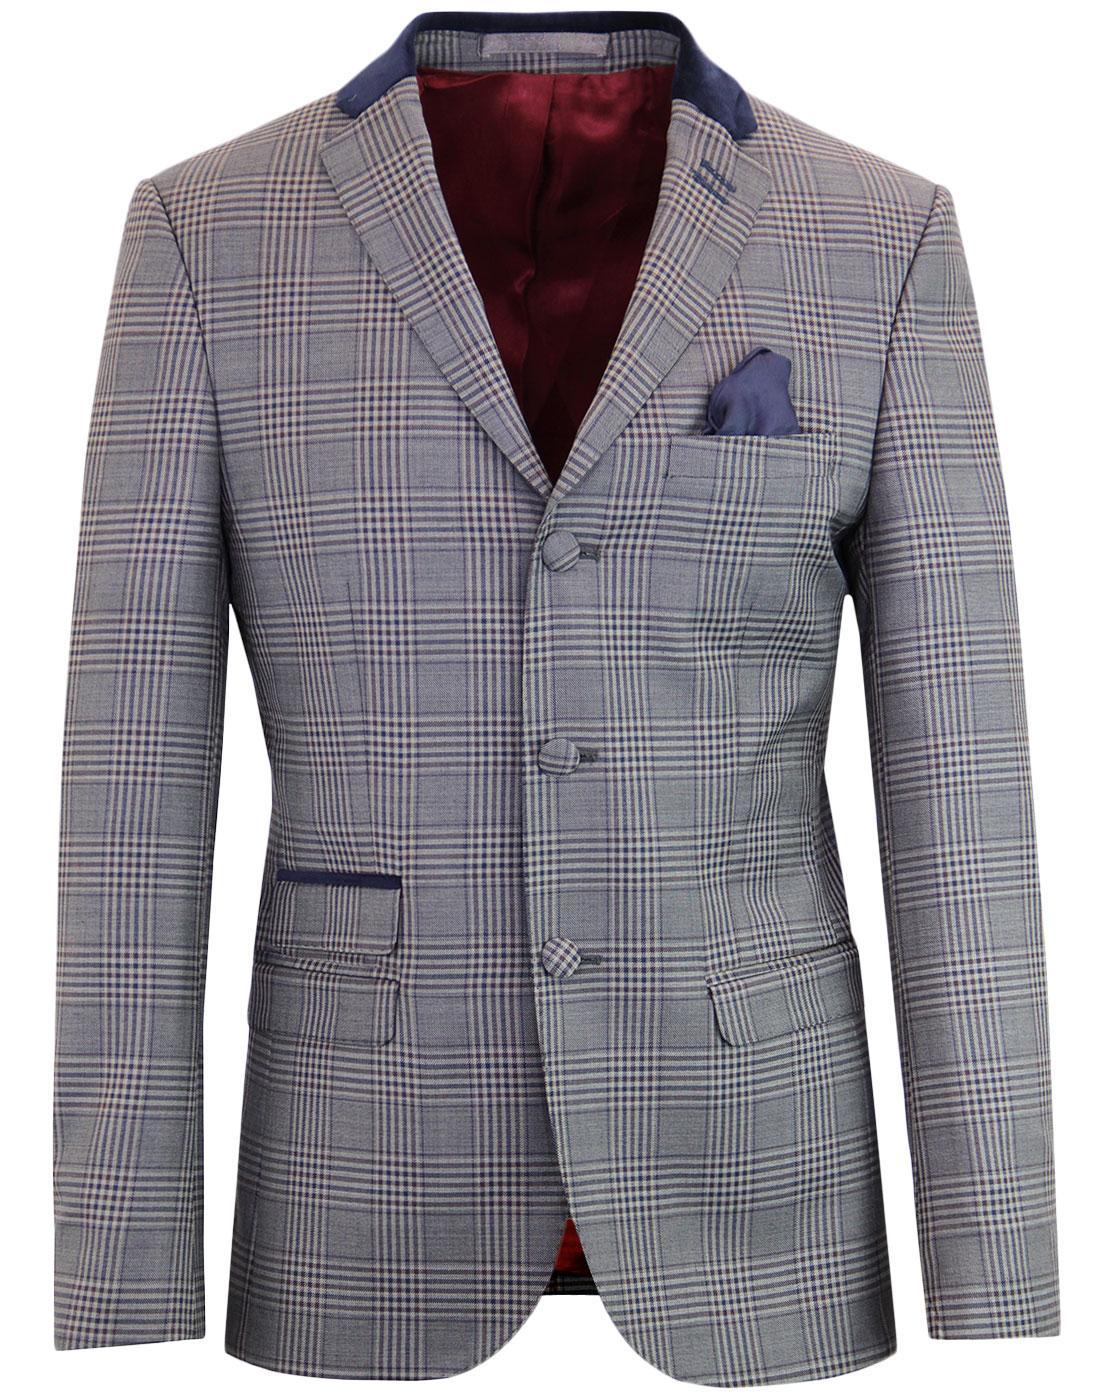 MADCAP ENGLAND POW Check Velvet Collar Suit Jacket